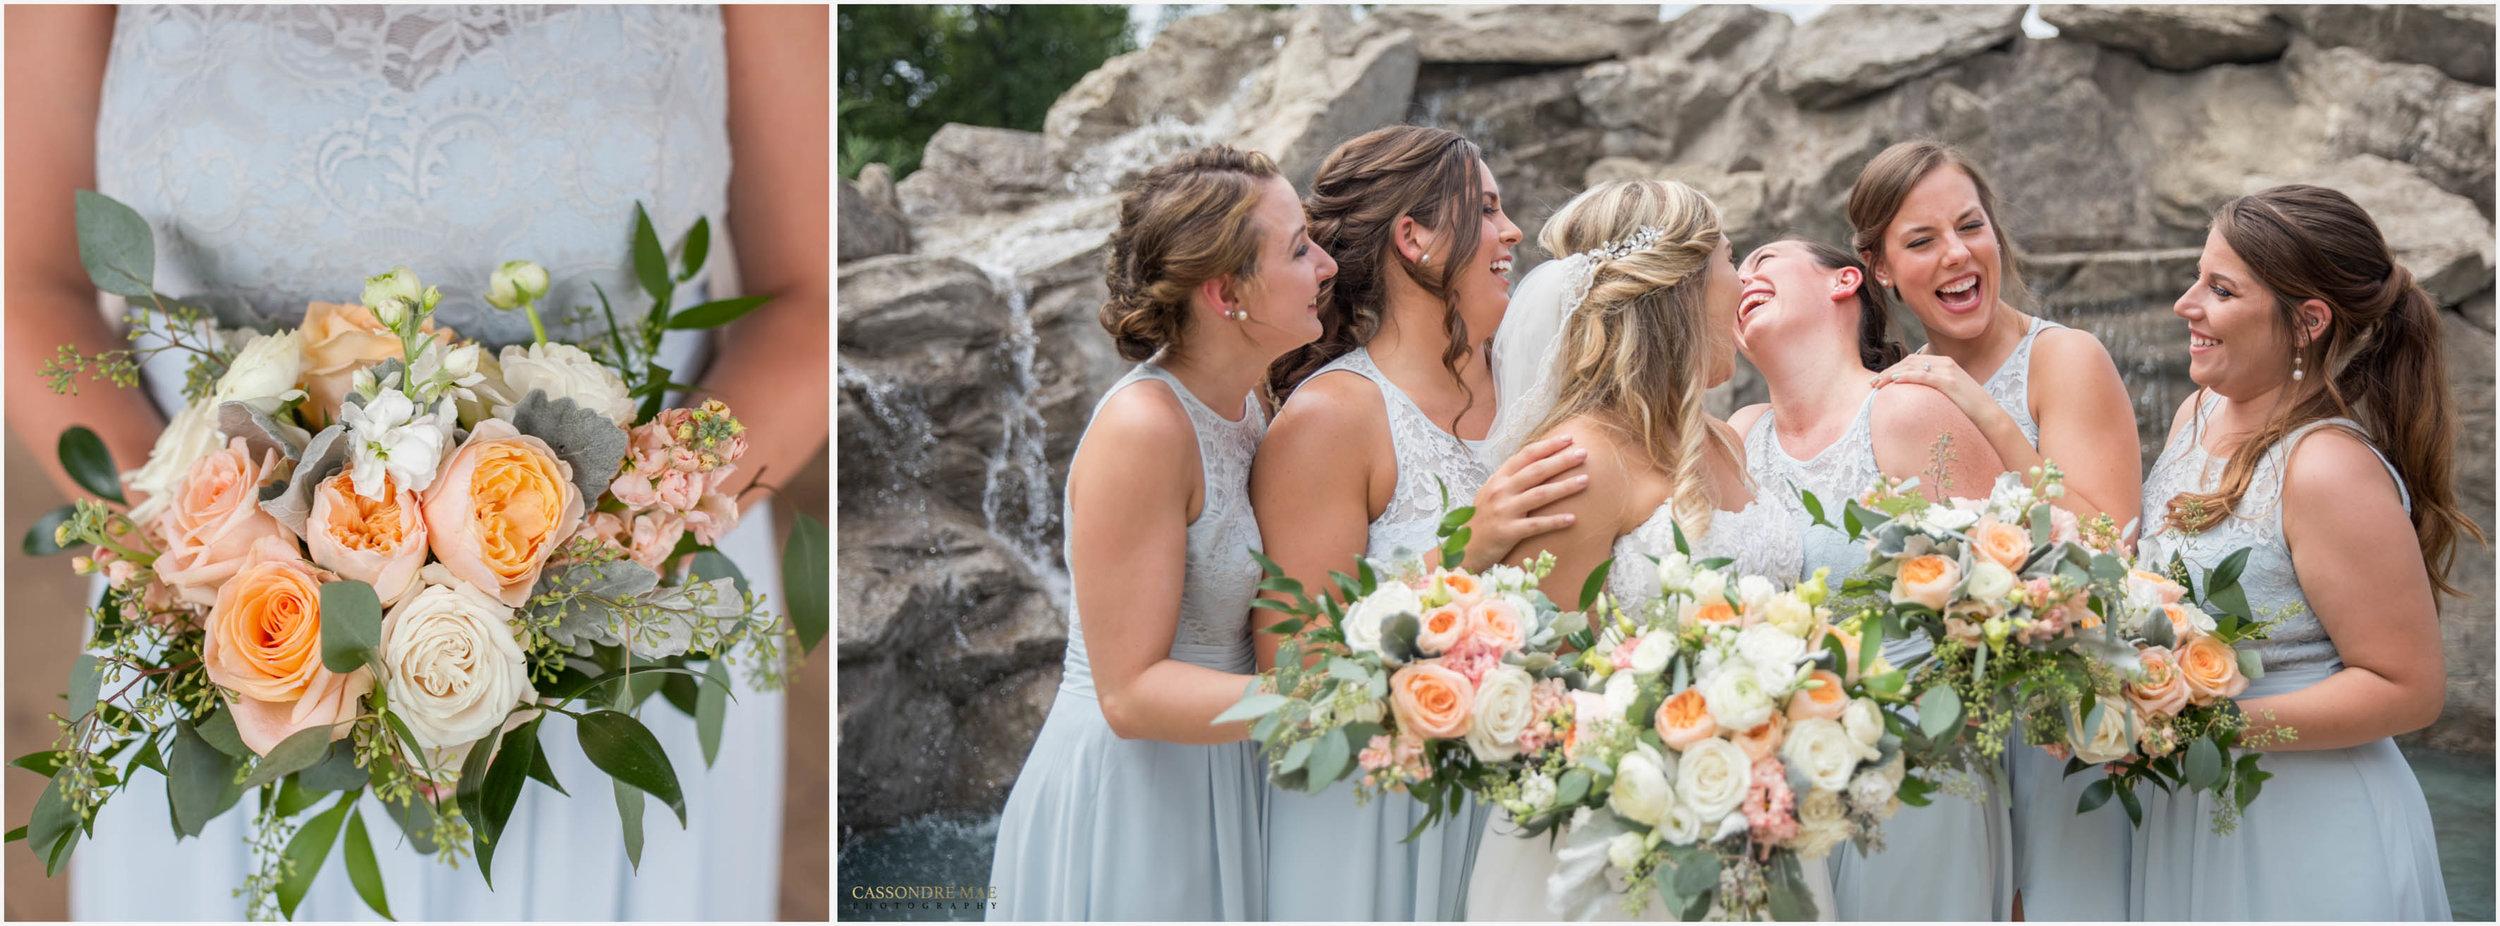 Cassondre Mae Photography Hudson Valley NY Wedding Photographer -17.jpg